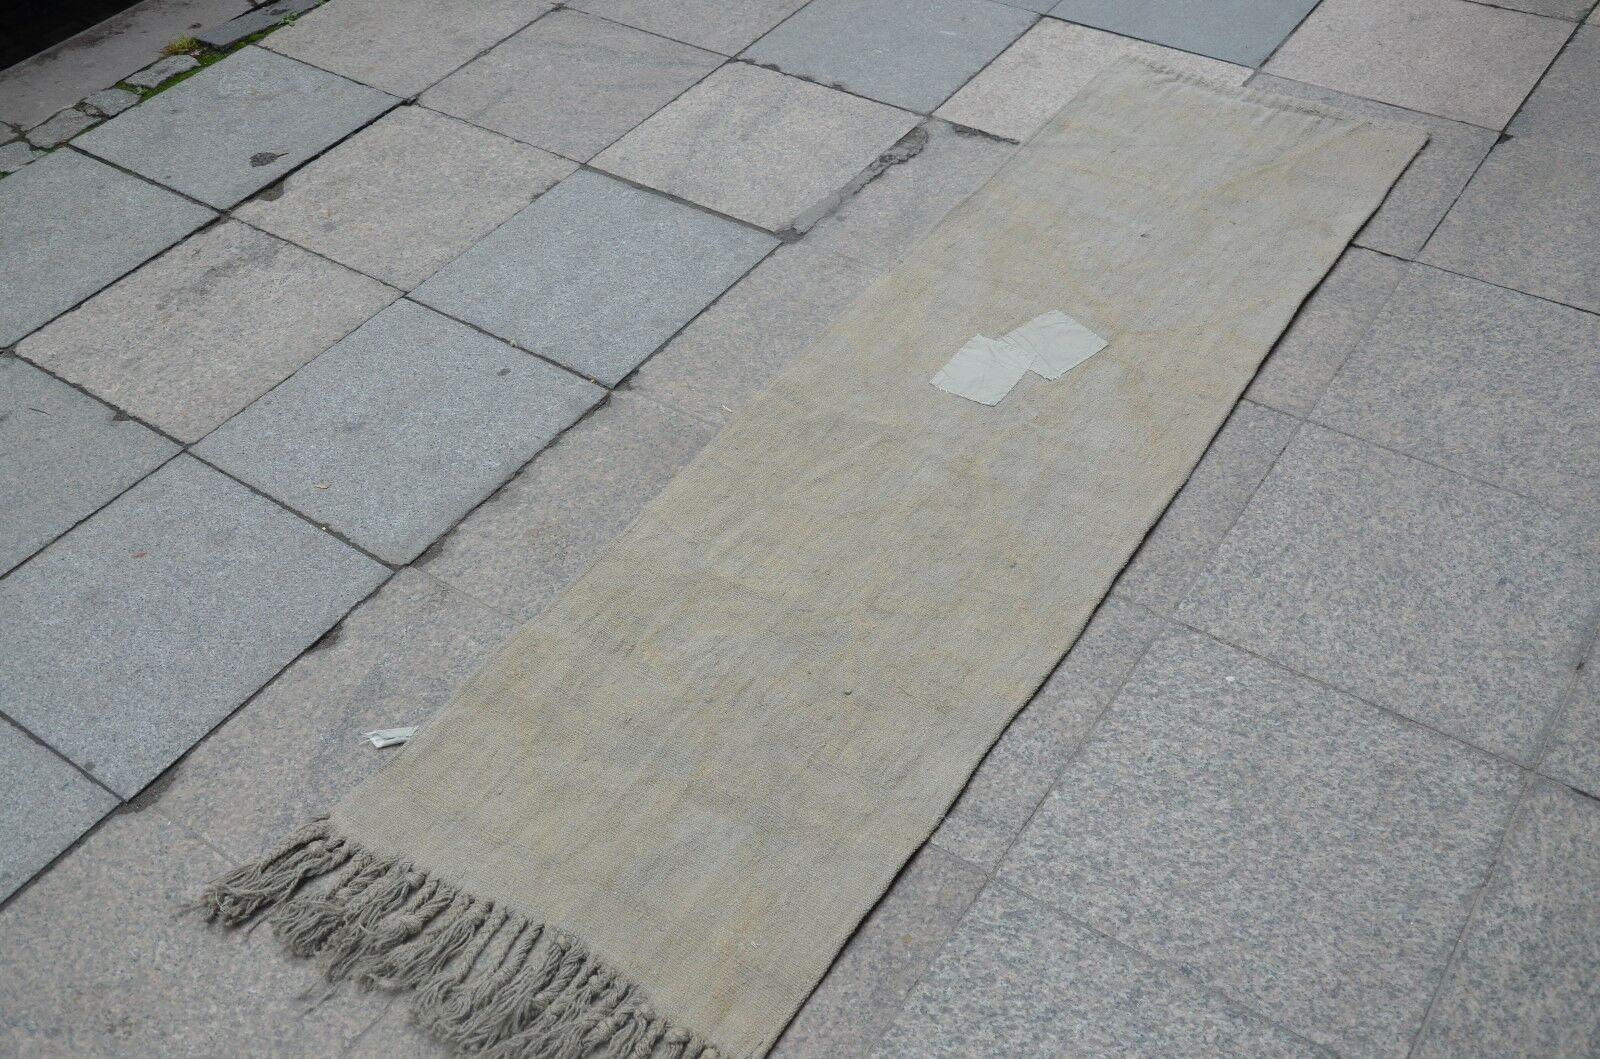 Alfombras de cáñamo, Antiguo Alfombra de cáñamo, alfombras Vintage, Vintage, Vintage, alfombras, tejidos a mano hemprug turco Tejidos A Mano 47eb01